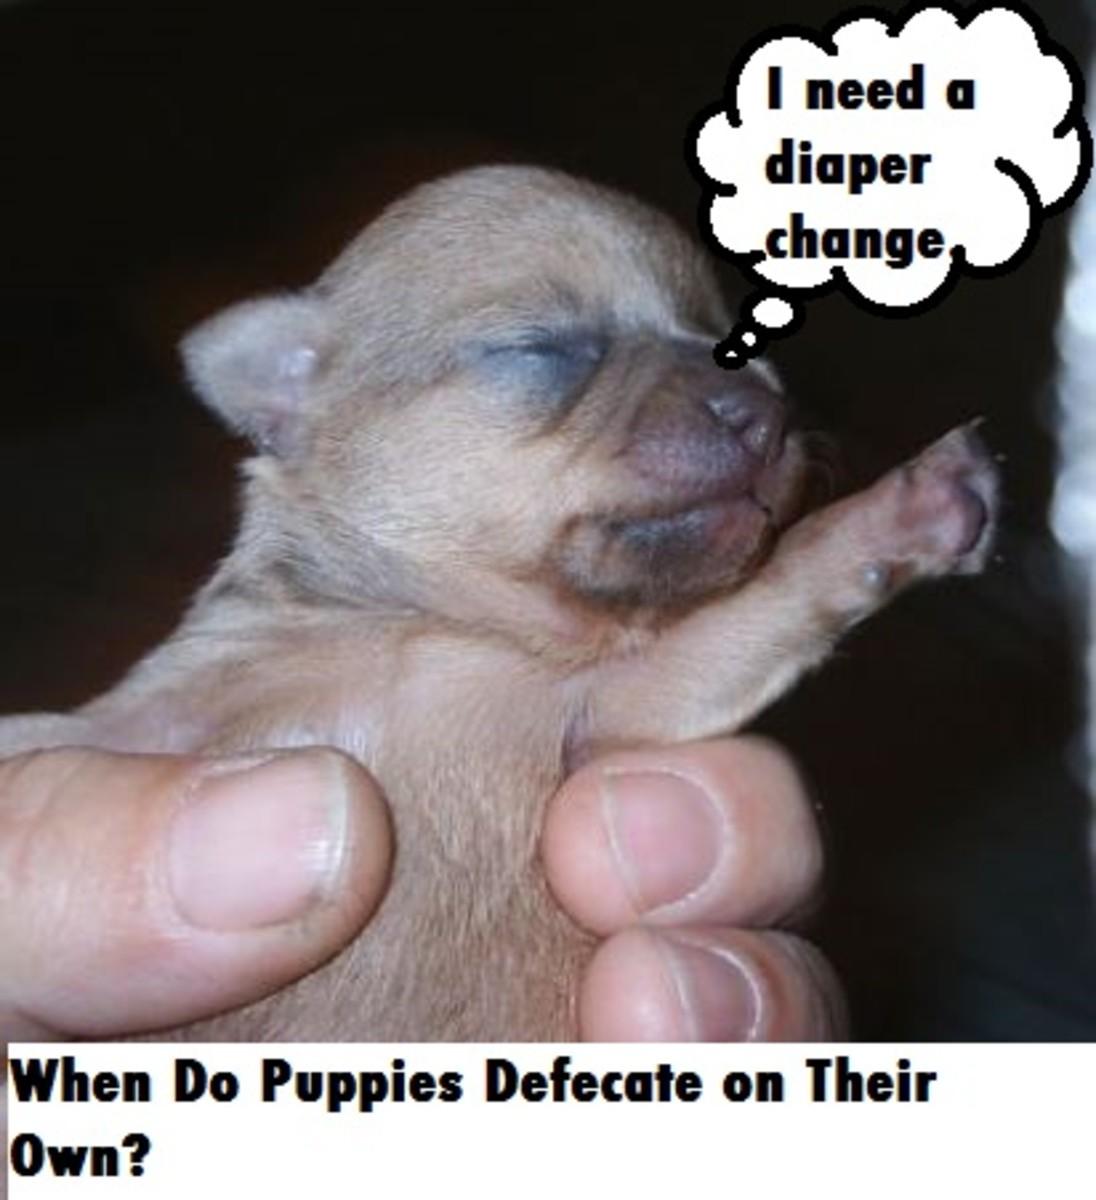 puppy defecate